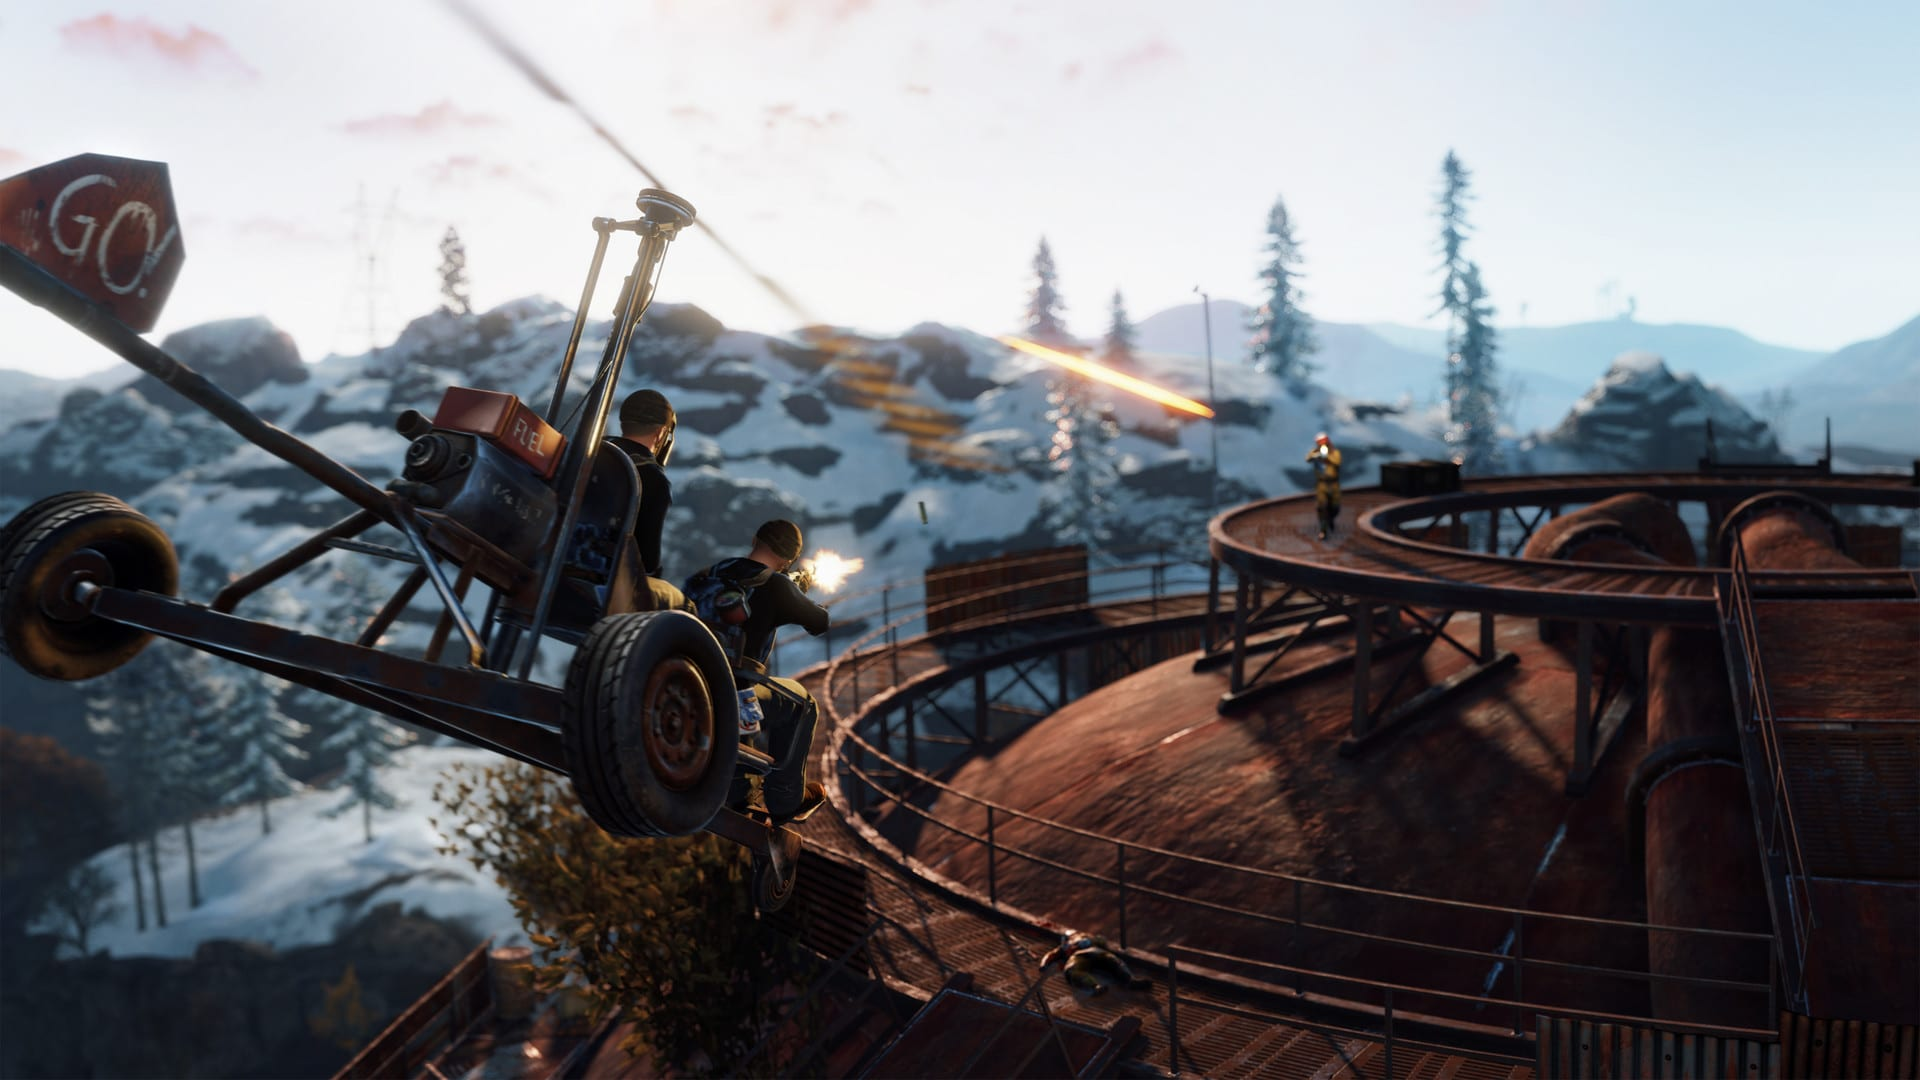 rust video game screenshot wallpaper 74563